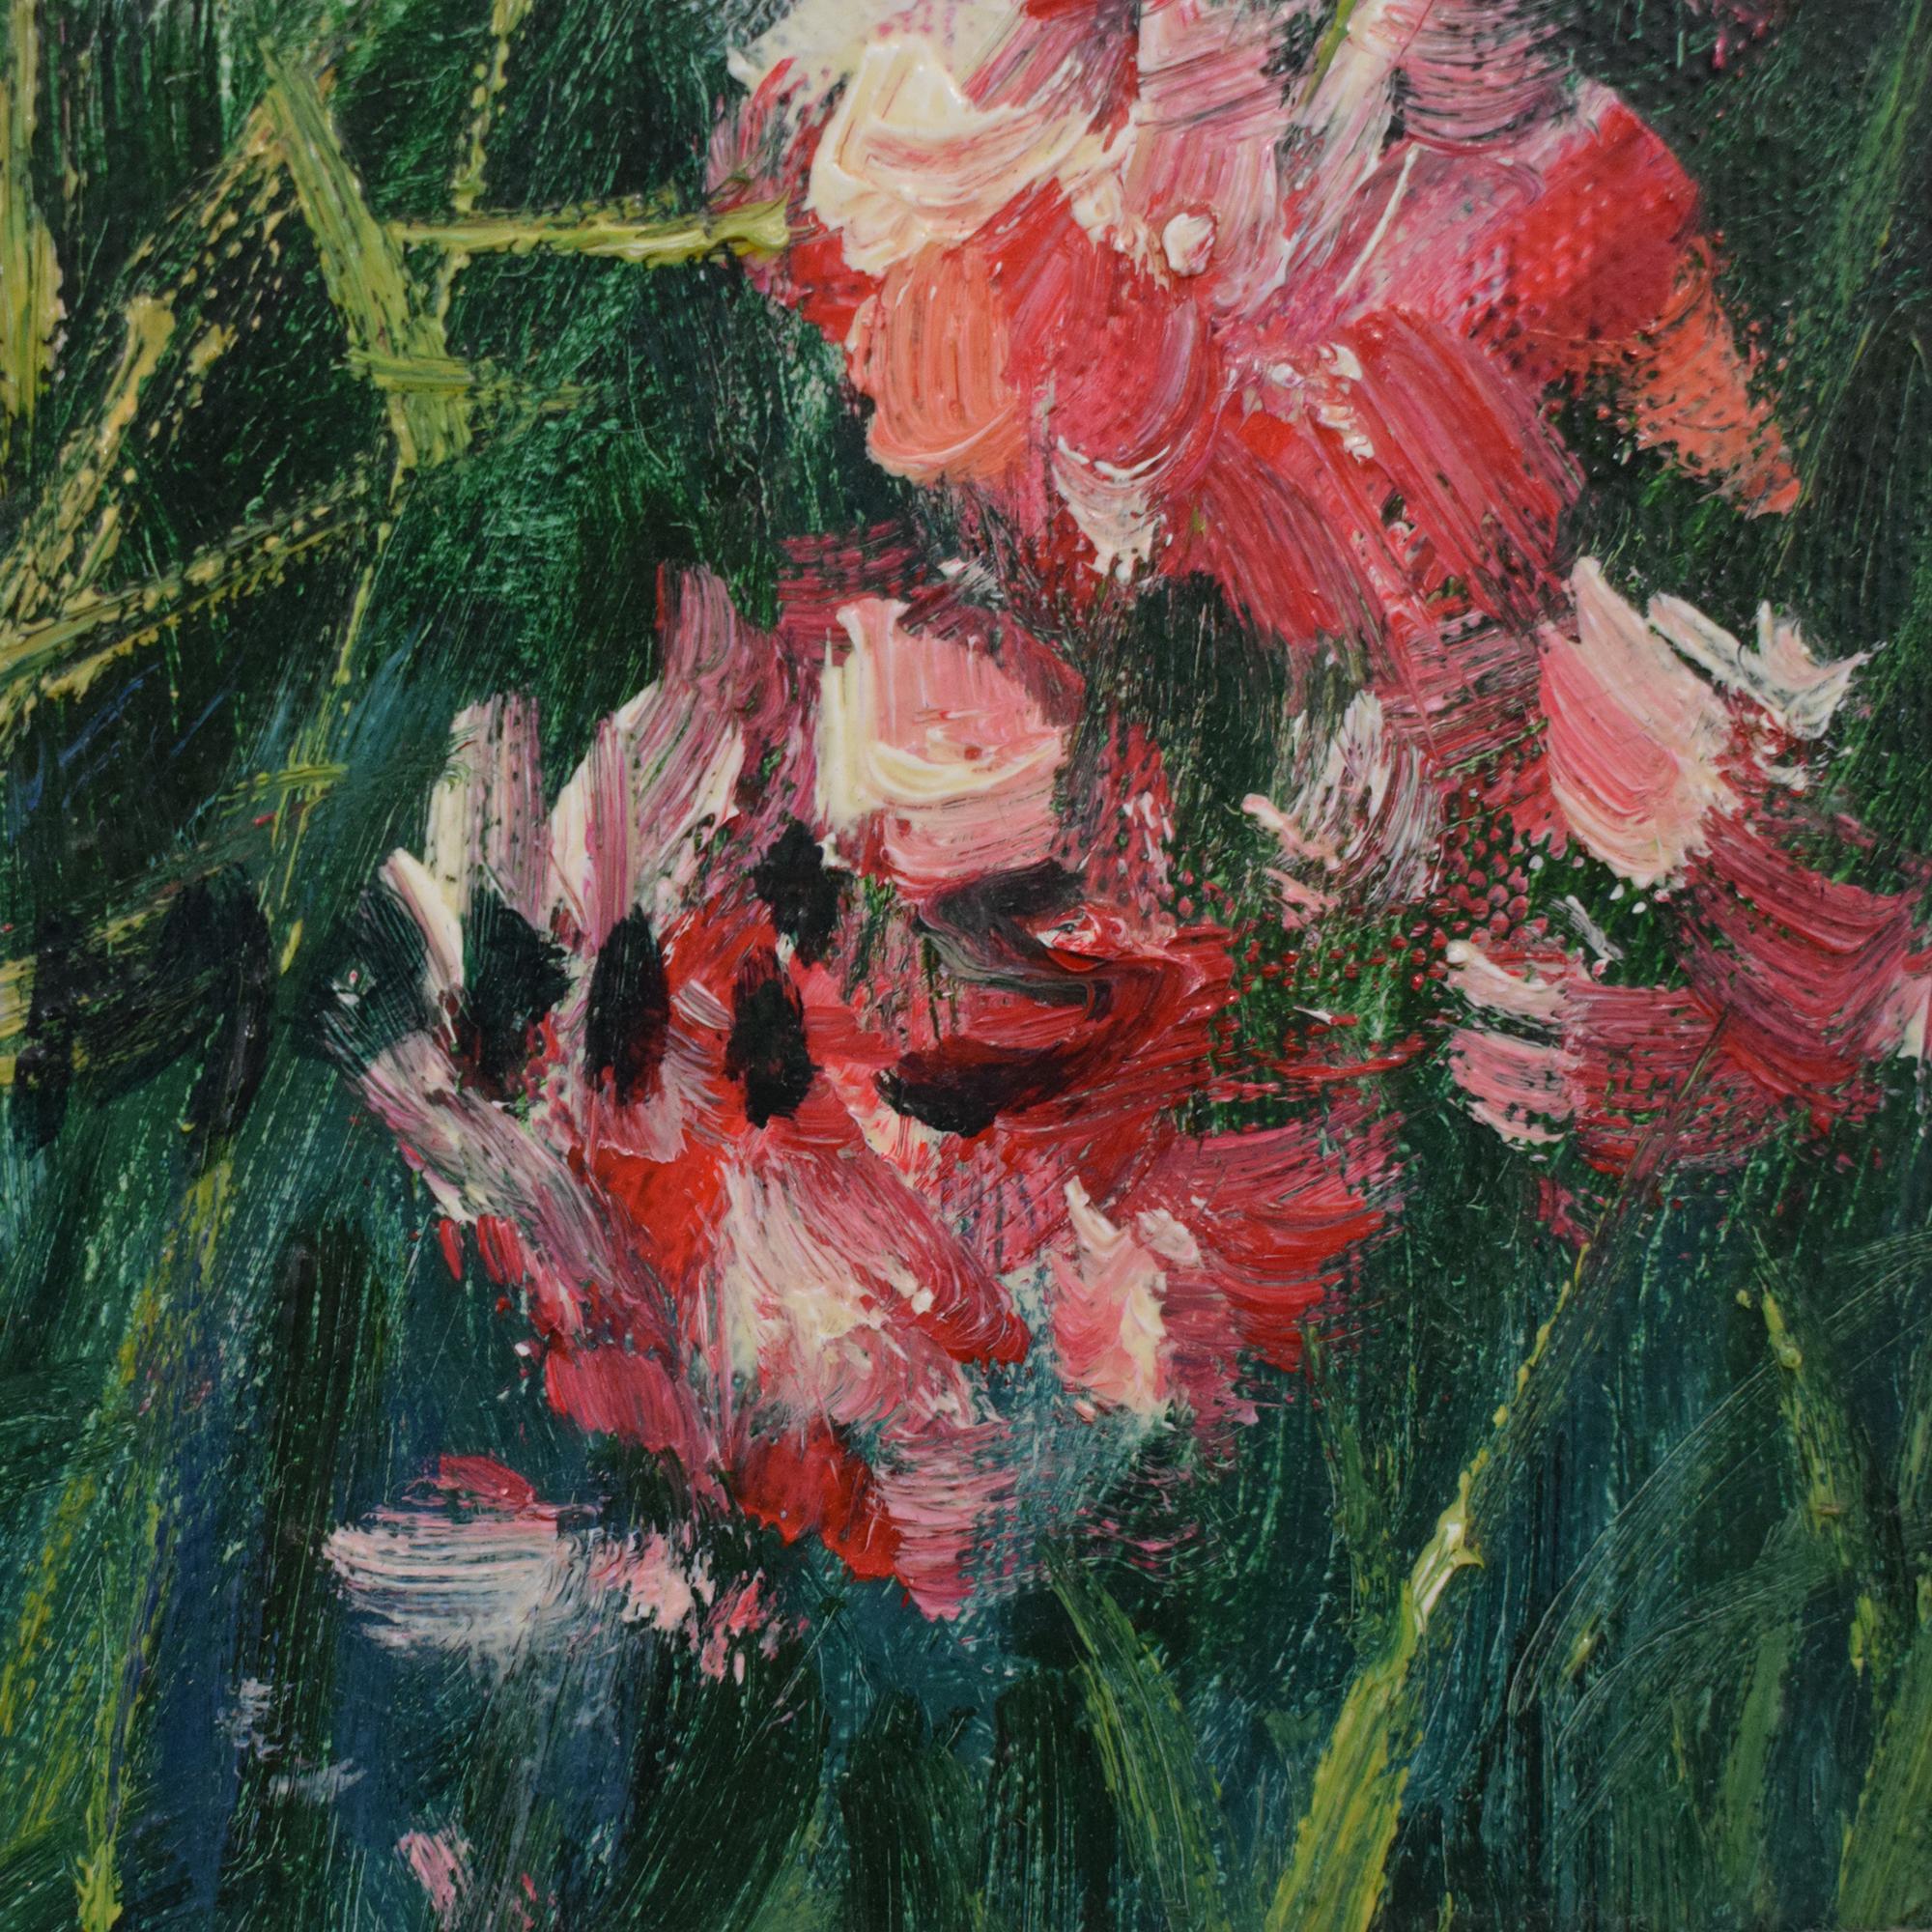 Framed Floral Wall Art ma